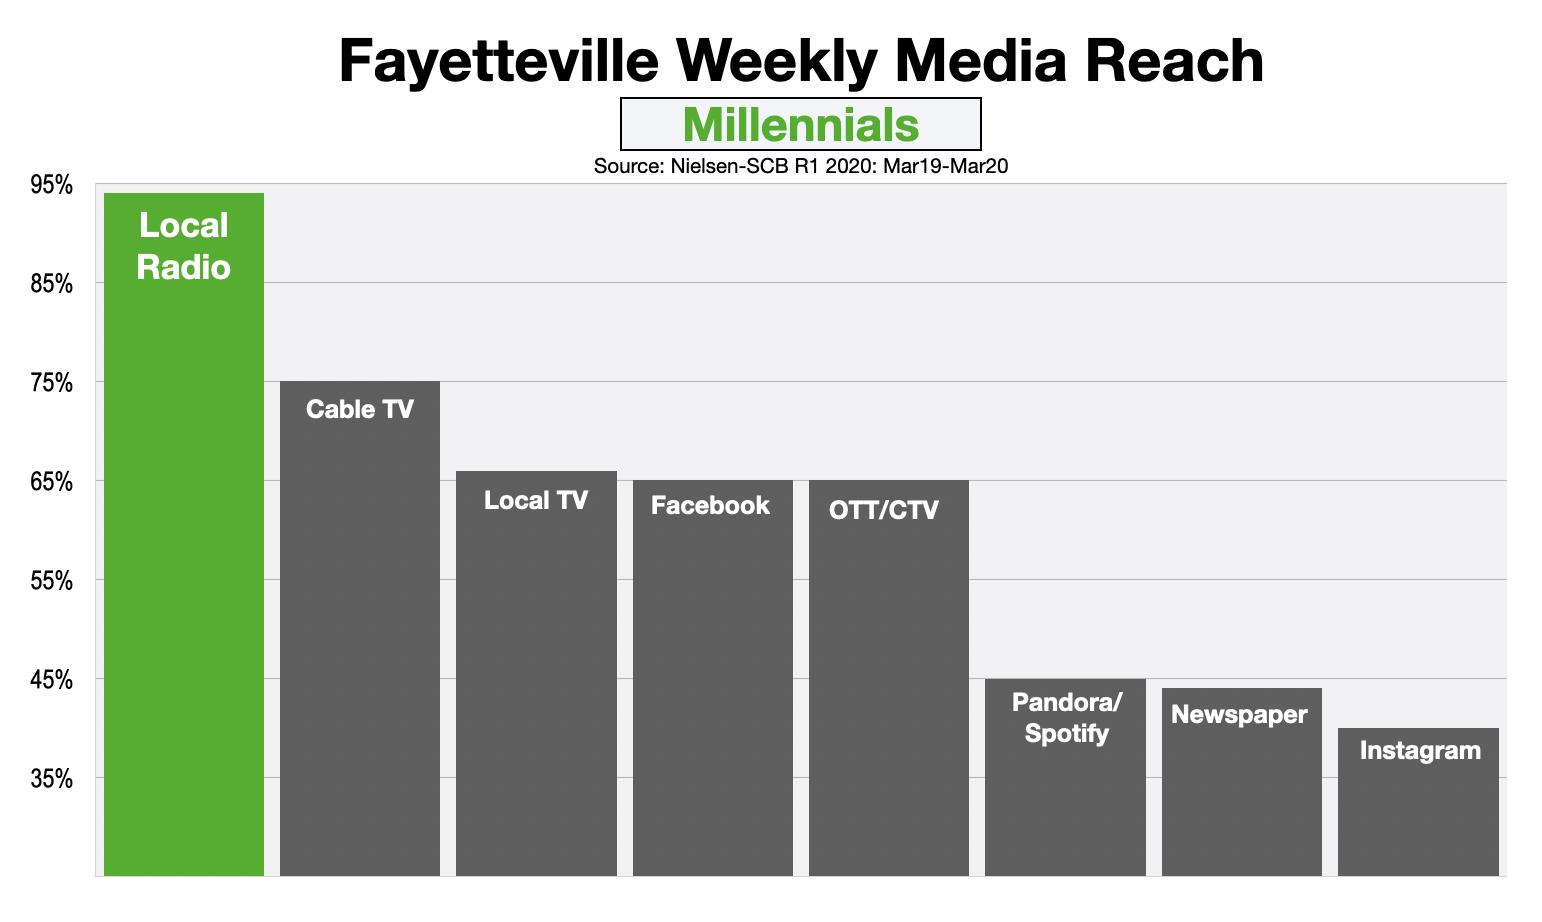 Advertising In Fayetteville Reaching Millennials 2020